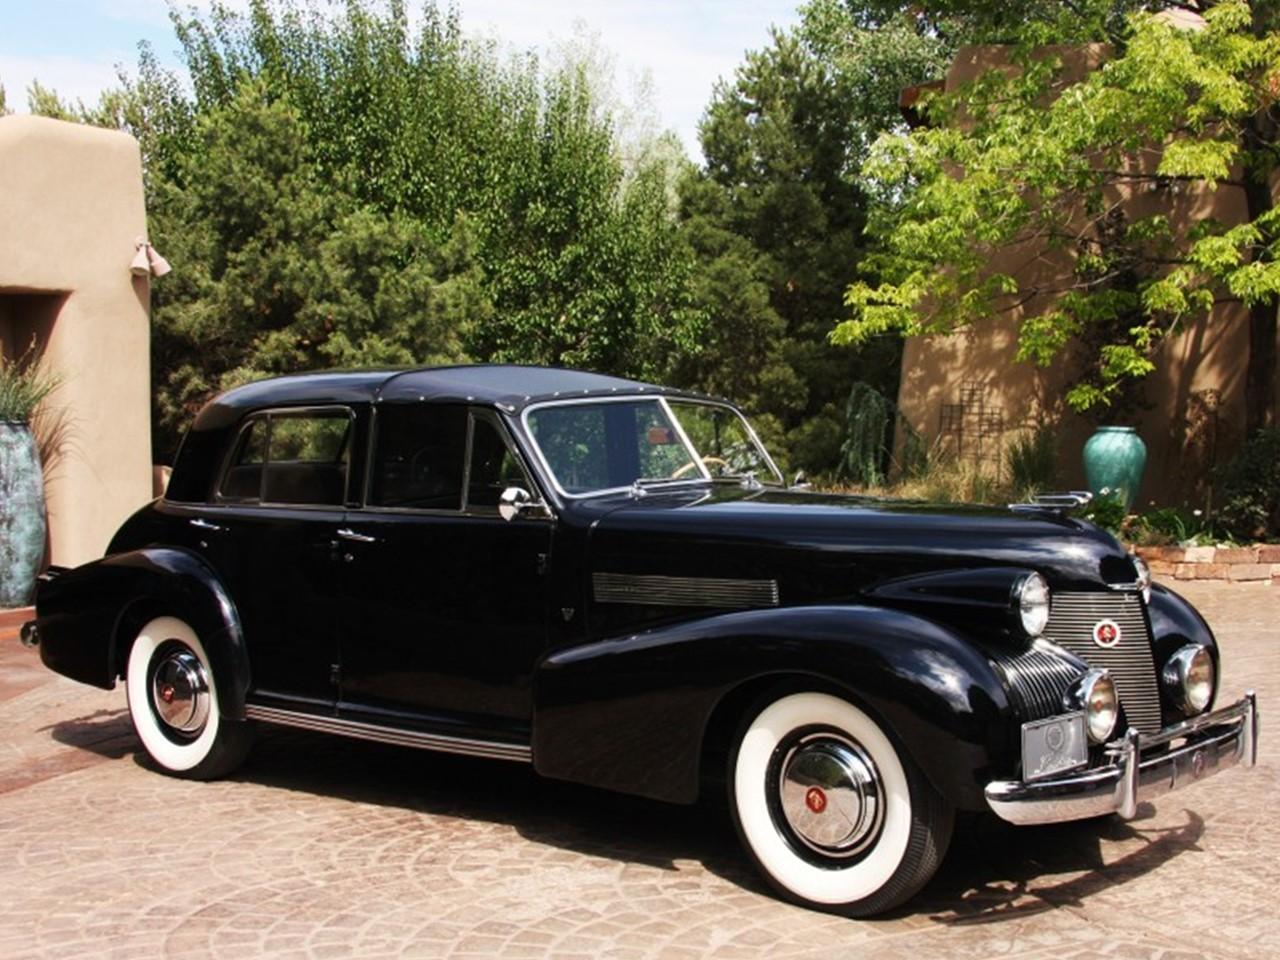 1939 Sixty-Special Derham Town Car 4